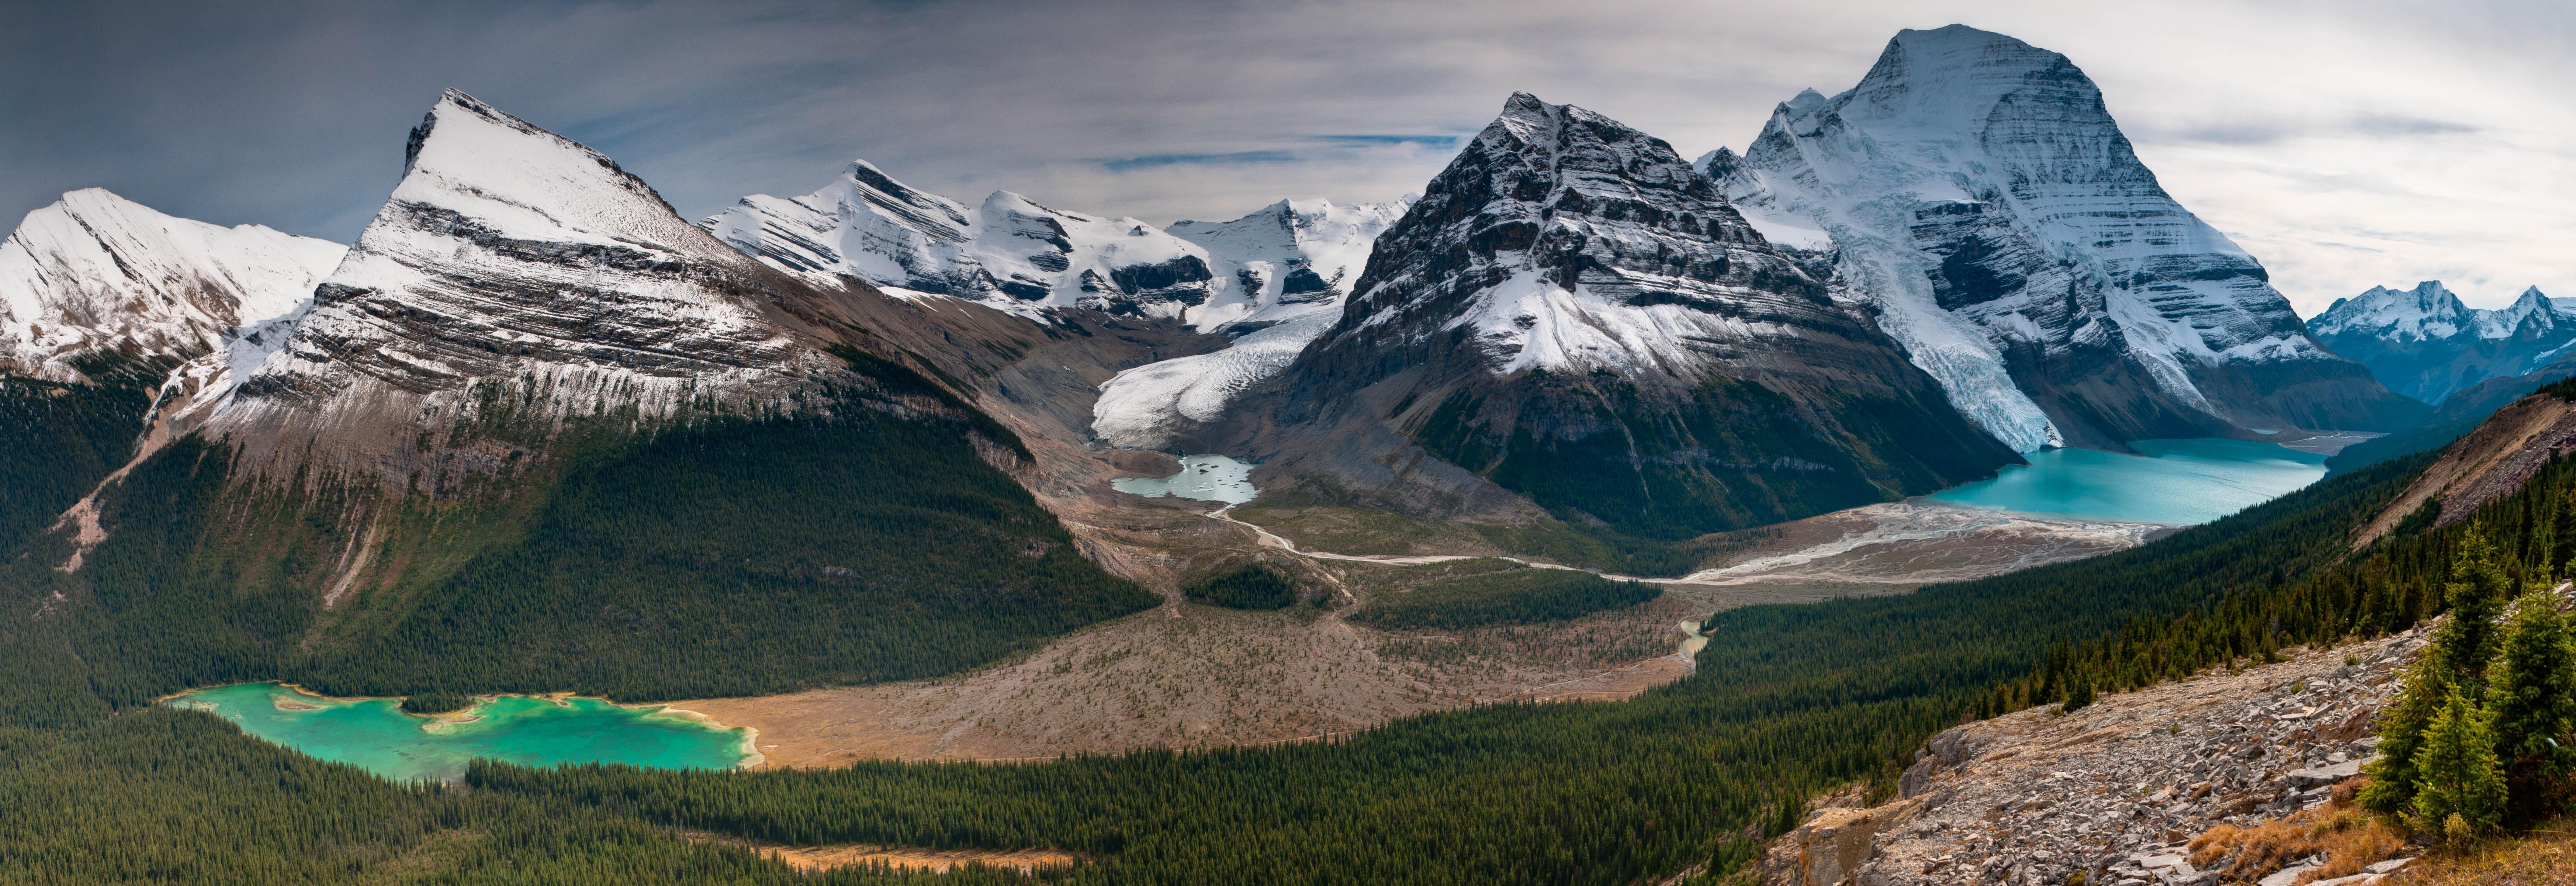 General 8472x2914 landscape Canada panorama nature